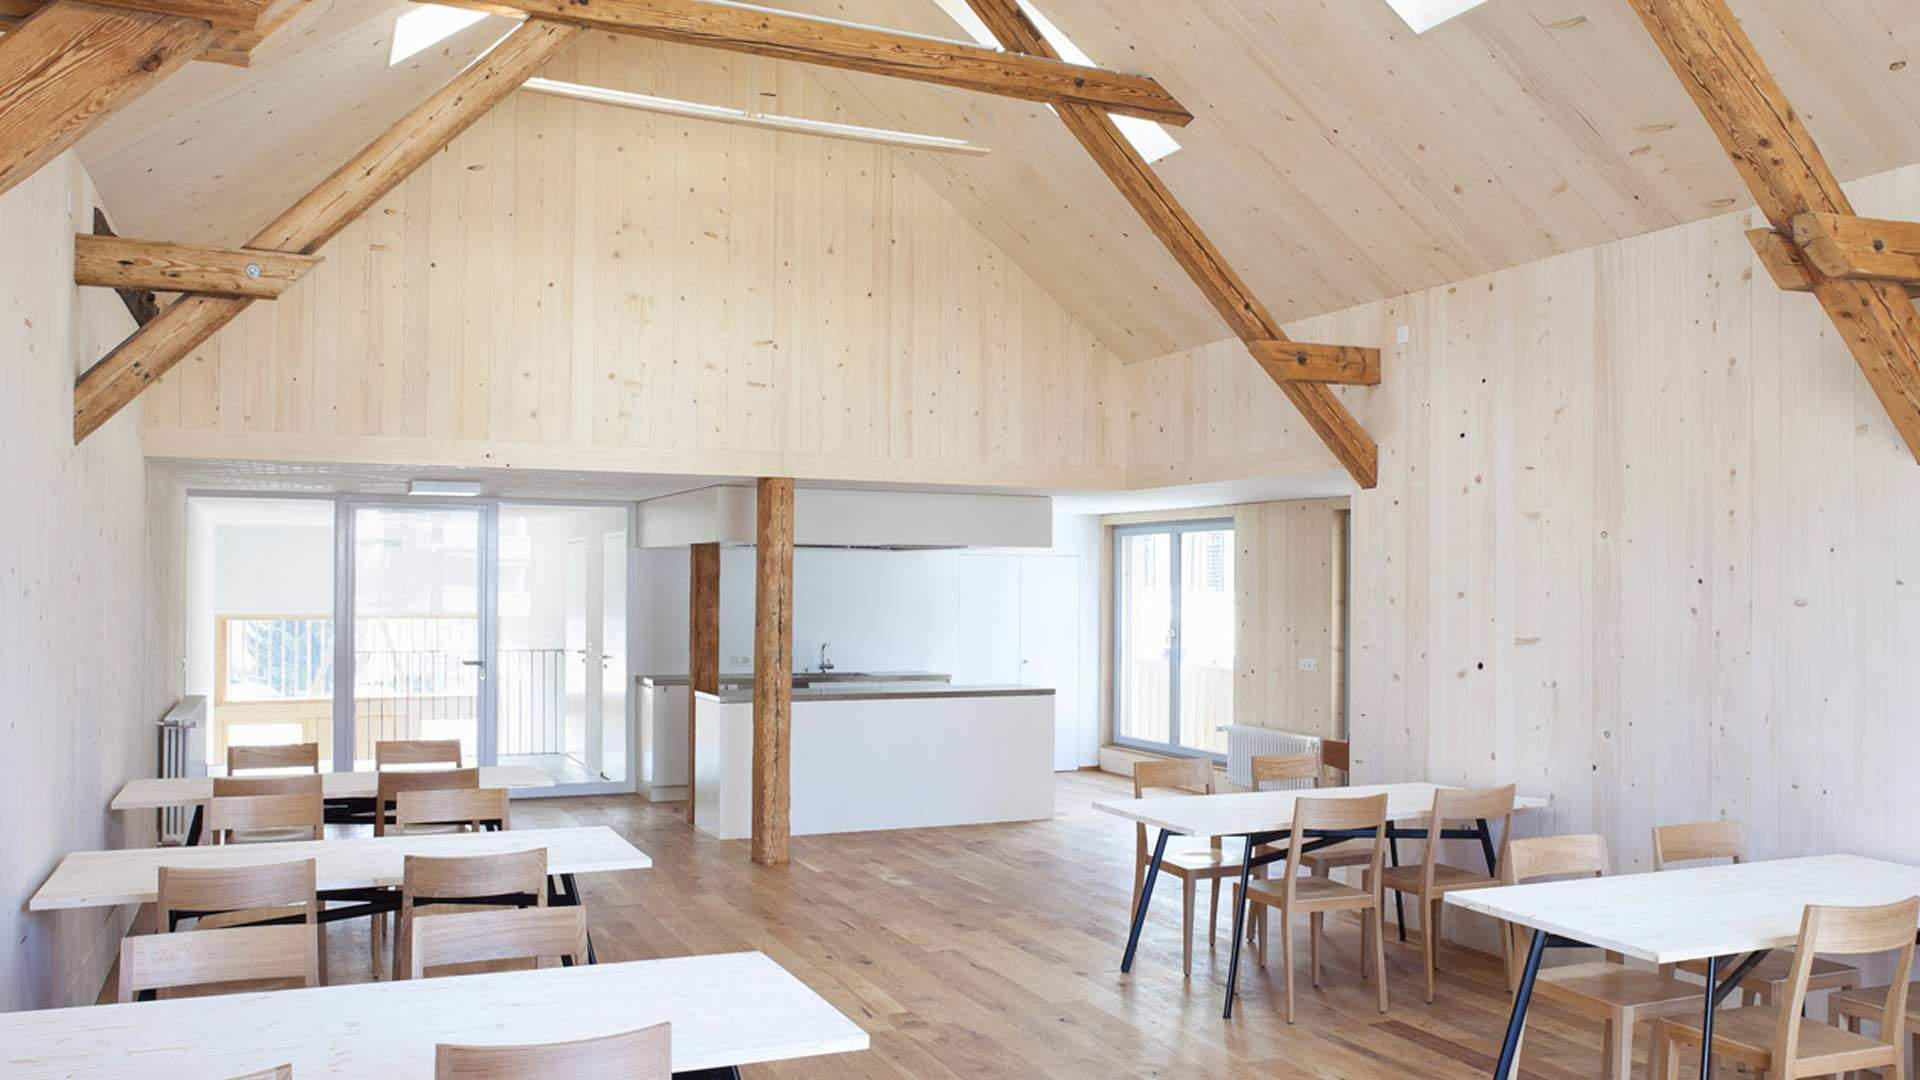 raum mieten f rderverein hegnerhof kloten kultur kurse feste. Black Bedroom Furniture Sets. Home Design Ideas